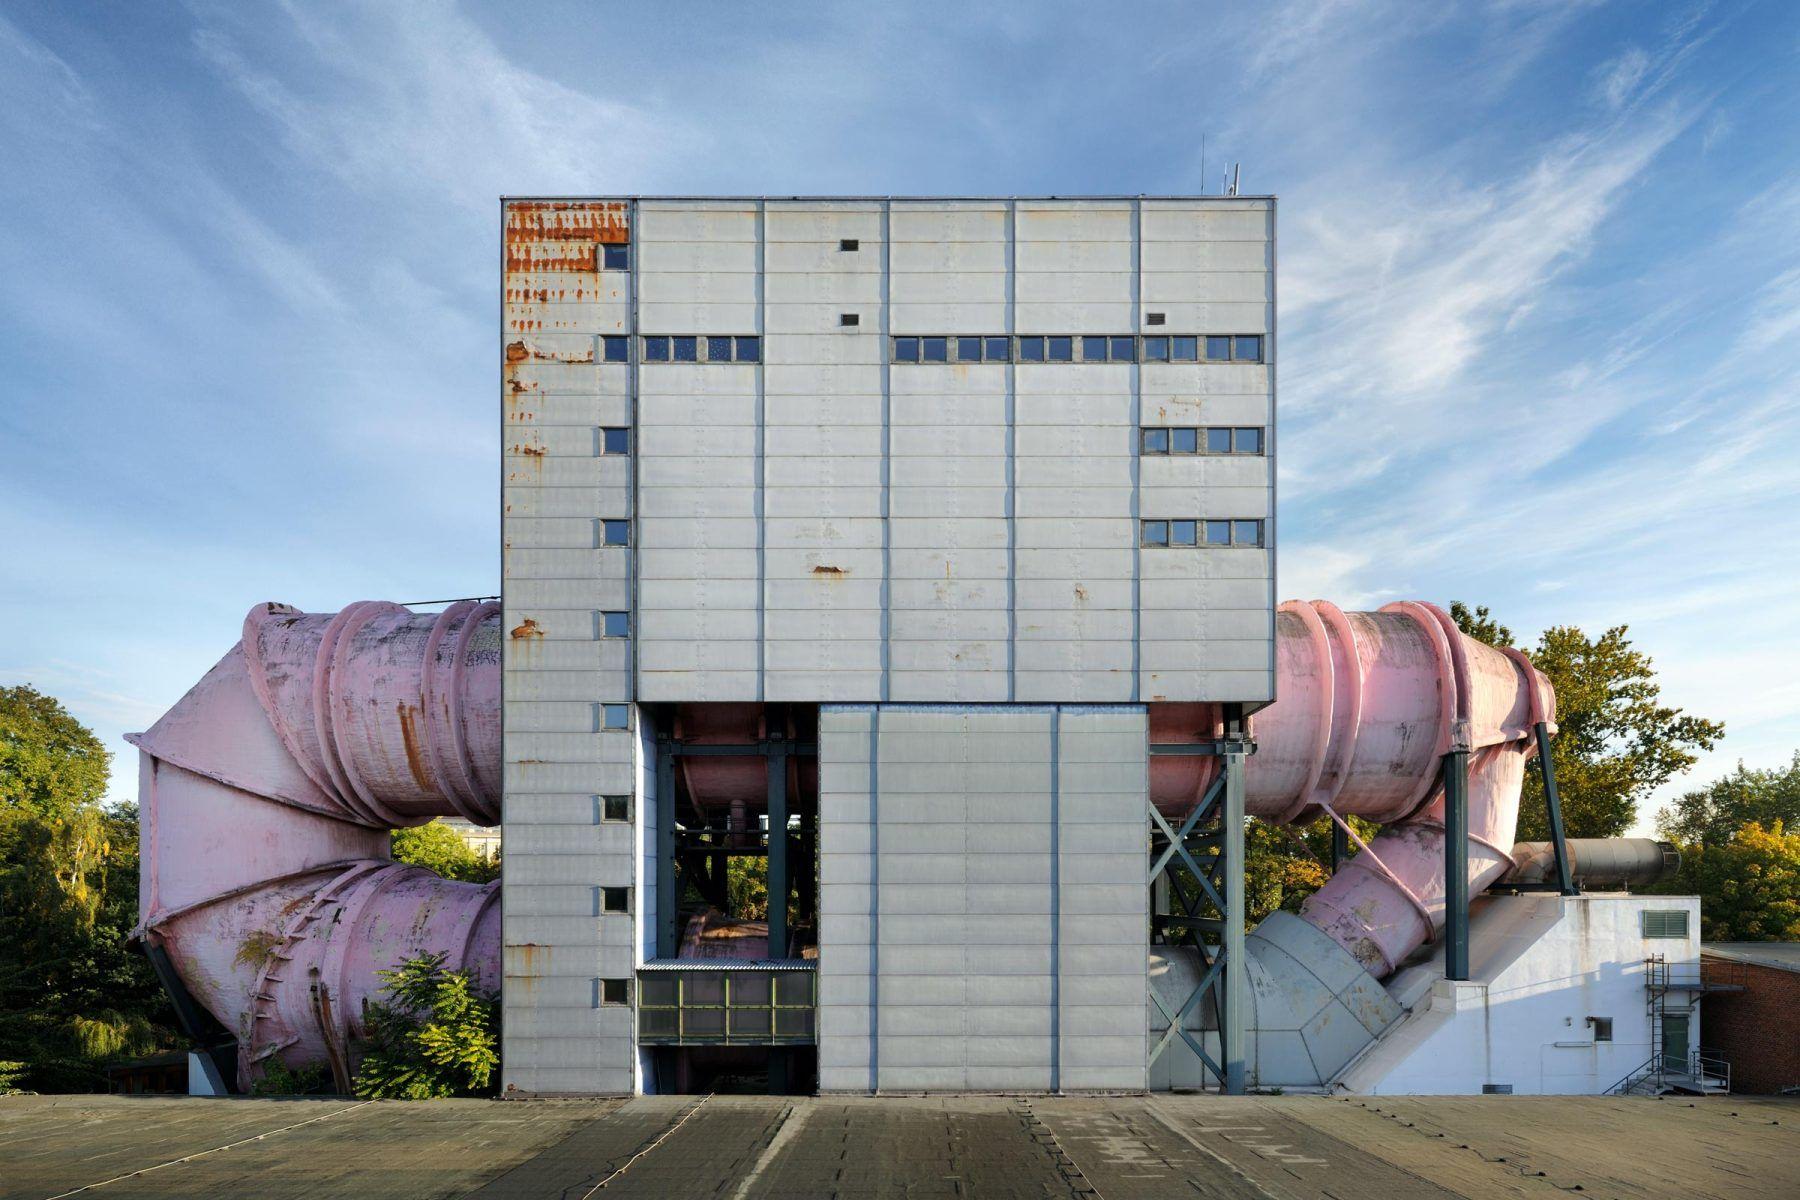 Konstruktivismus Architektur: Vom Konstruktivismus Zur Postmoderne